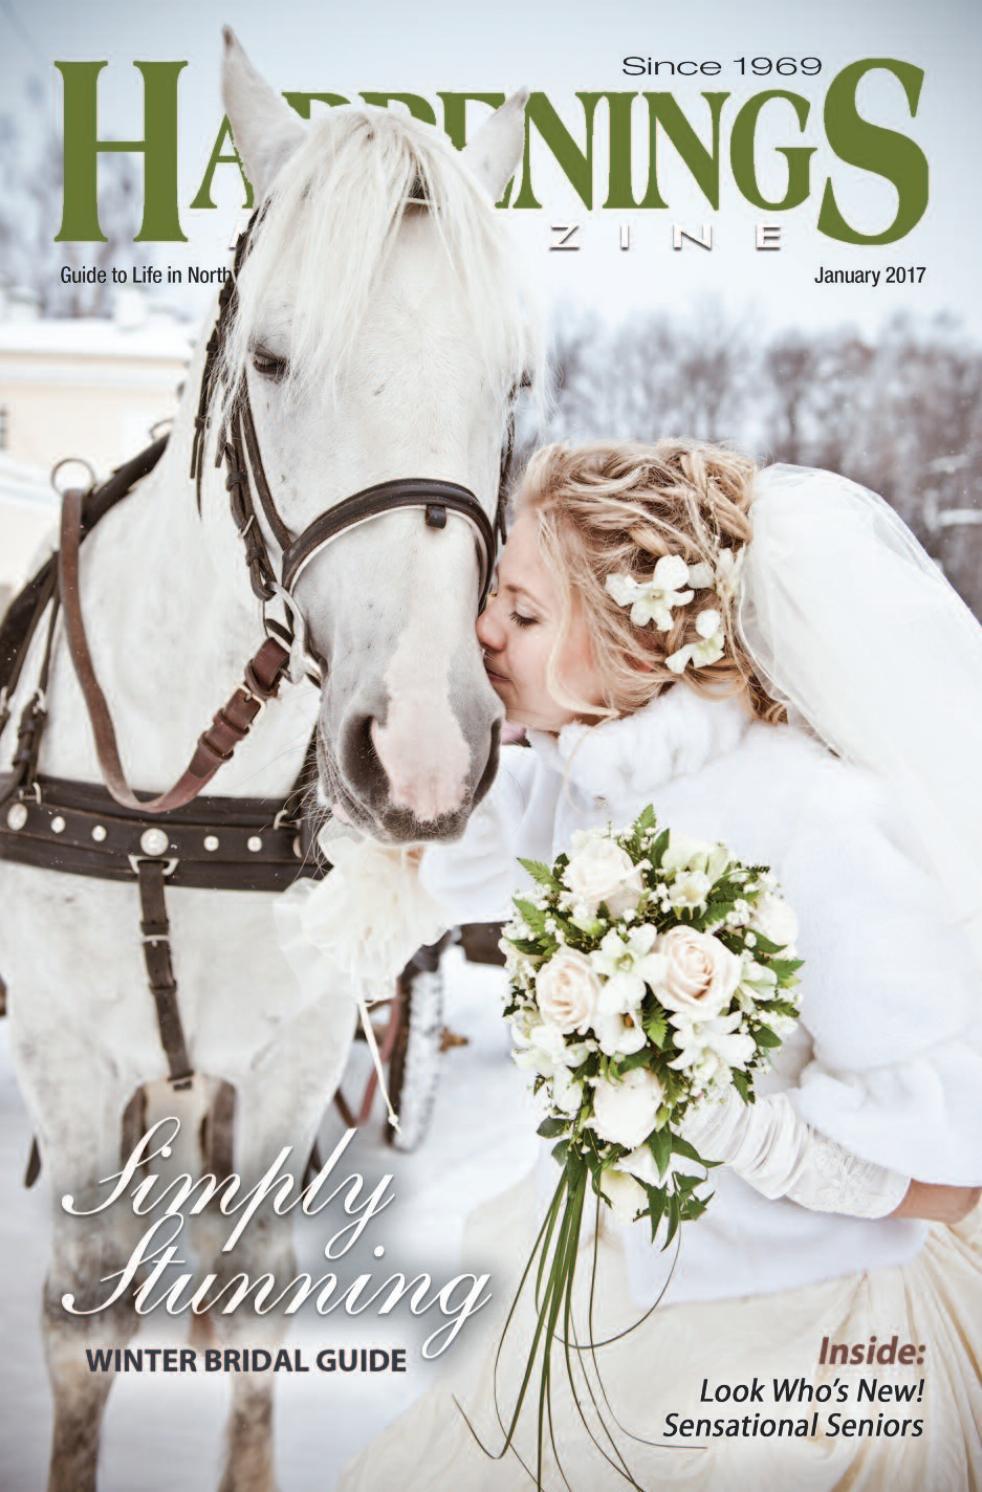 January 2017 Happenings Magazine by Happenings Magazine - issuu